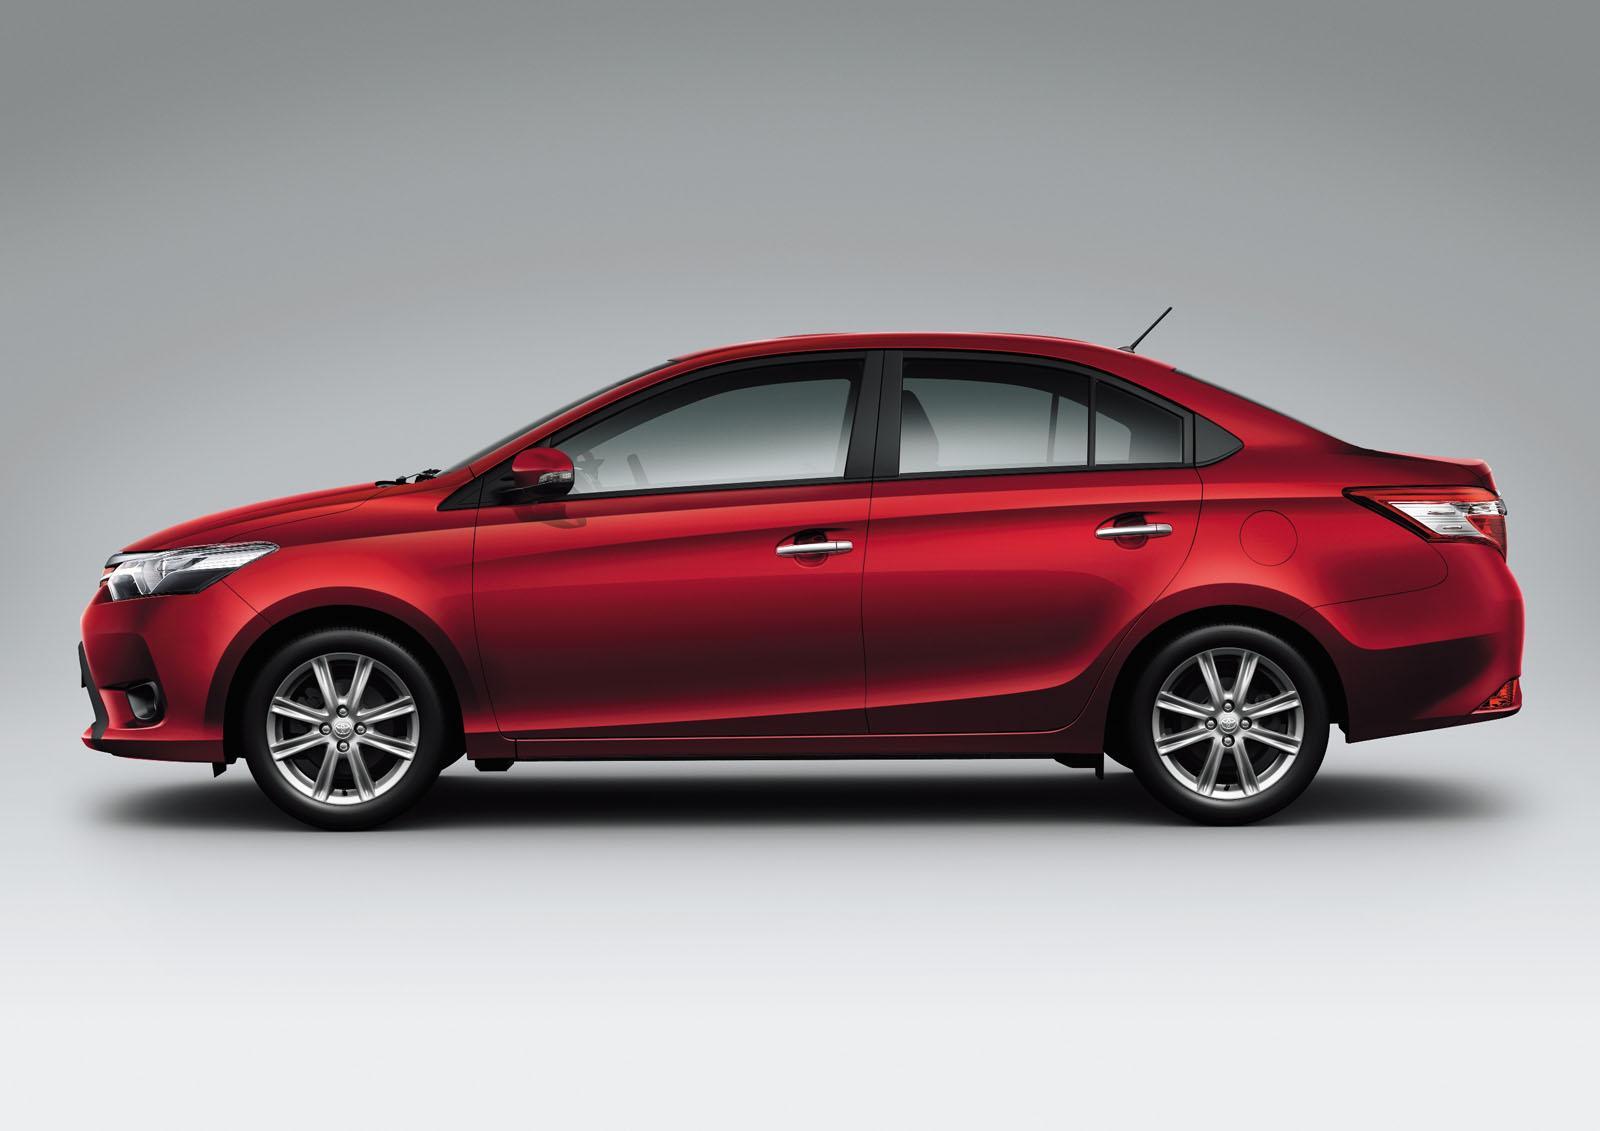 novo Toyota Vios 2014 lateral